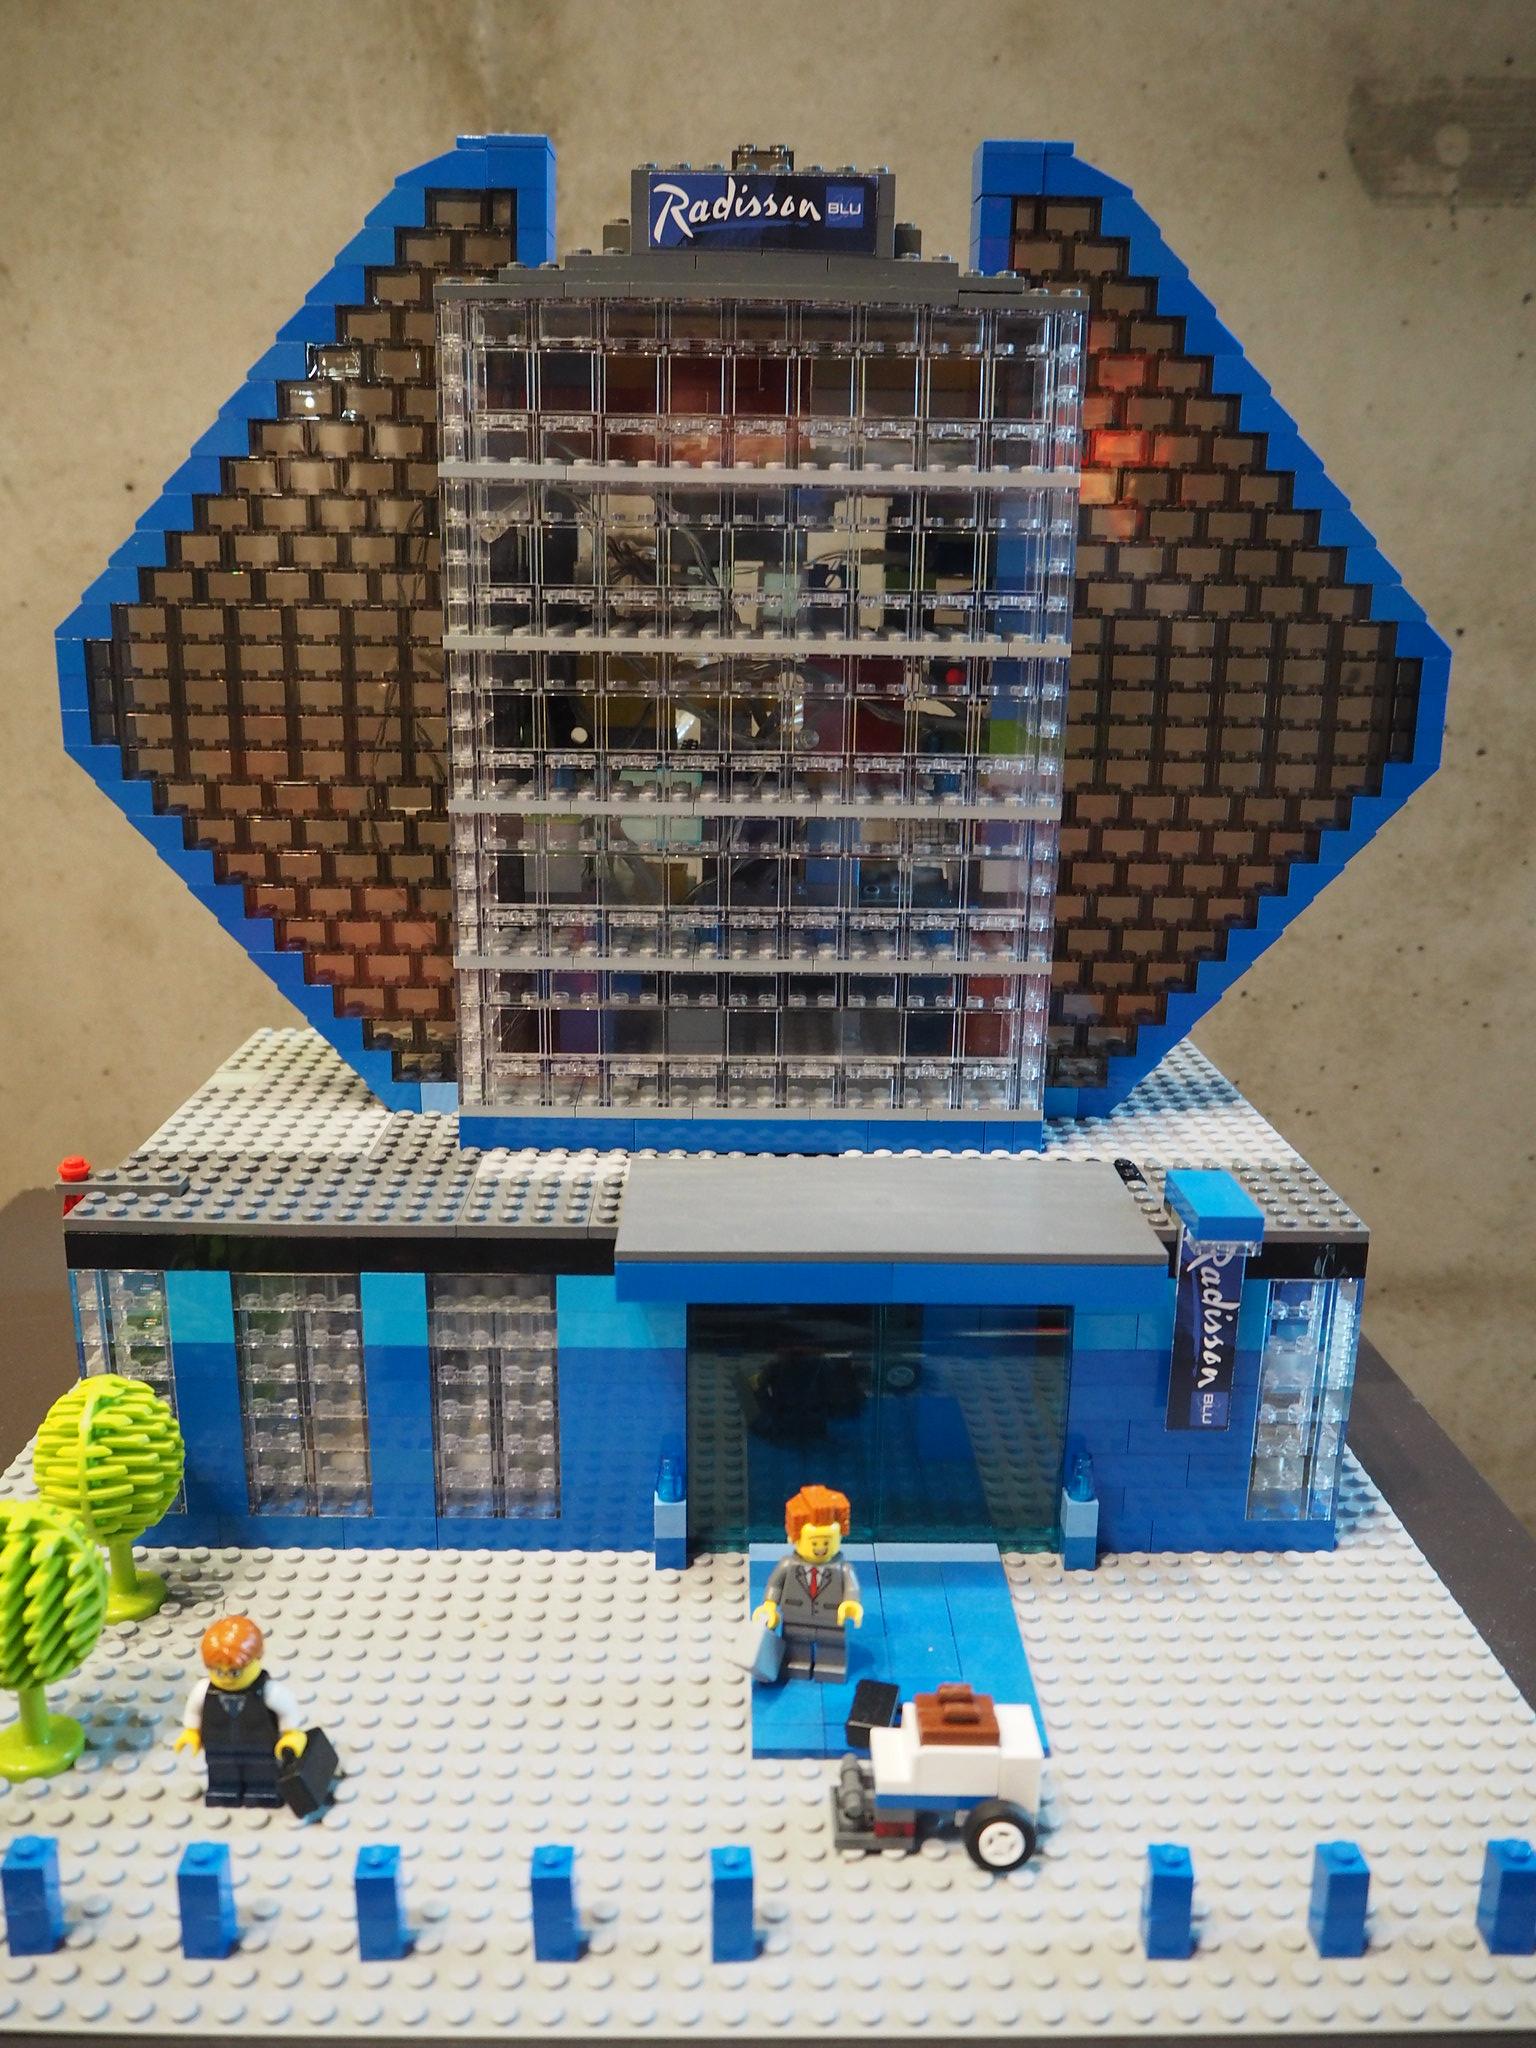 Radisson Blu Frankfurt - Lego Style